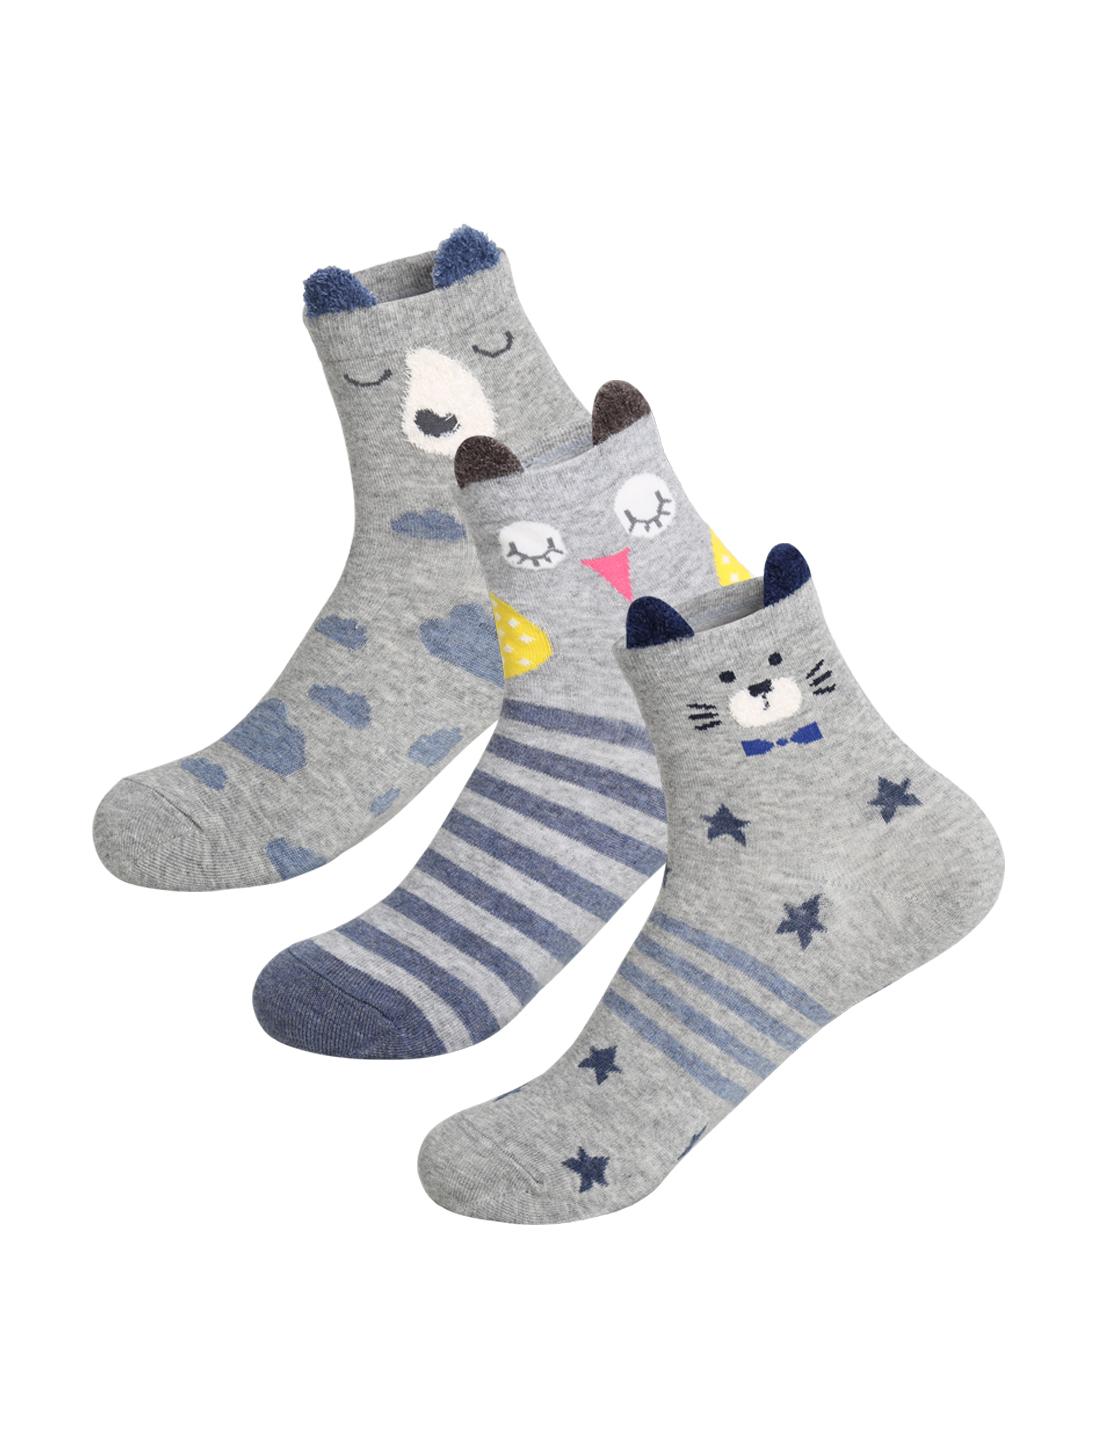 Women 3 pair Animal Stripes Novelty Dots Pattern Crew Socks 9-11 Gray